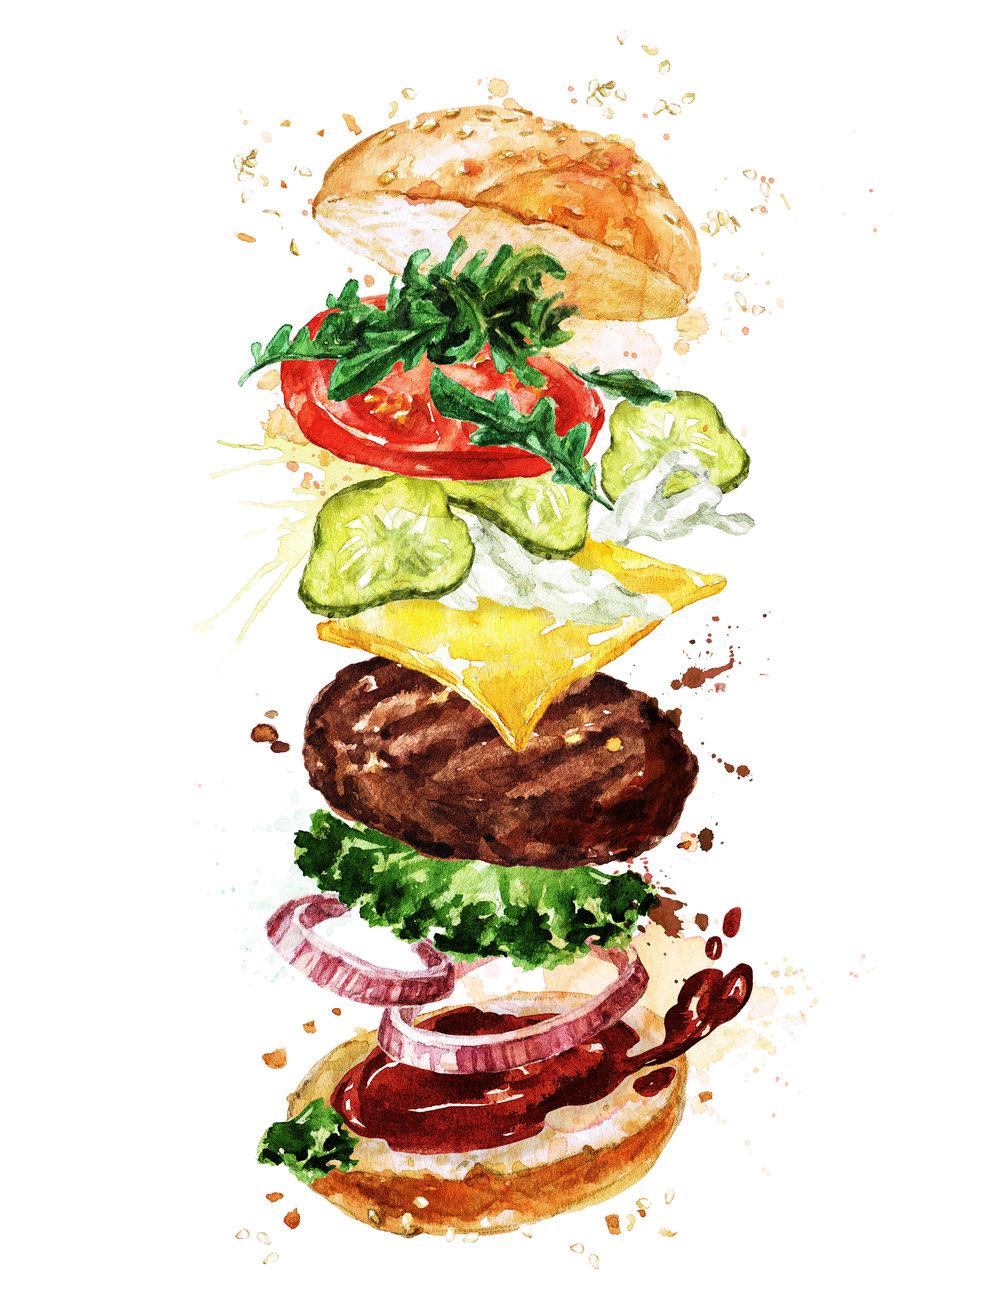 BURGERS_flying_cheeseburger2_150717.jpg